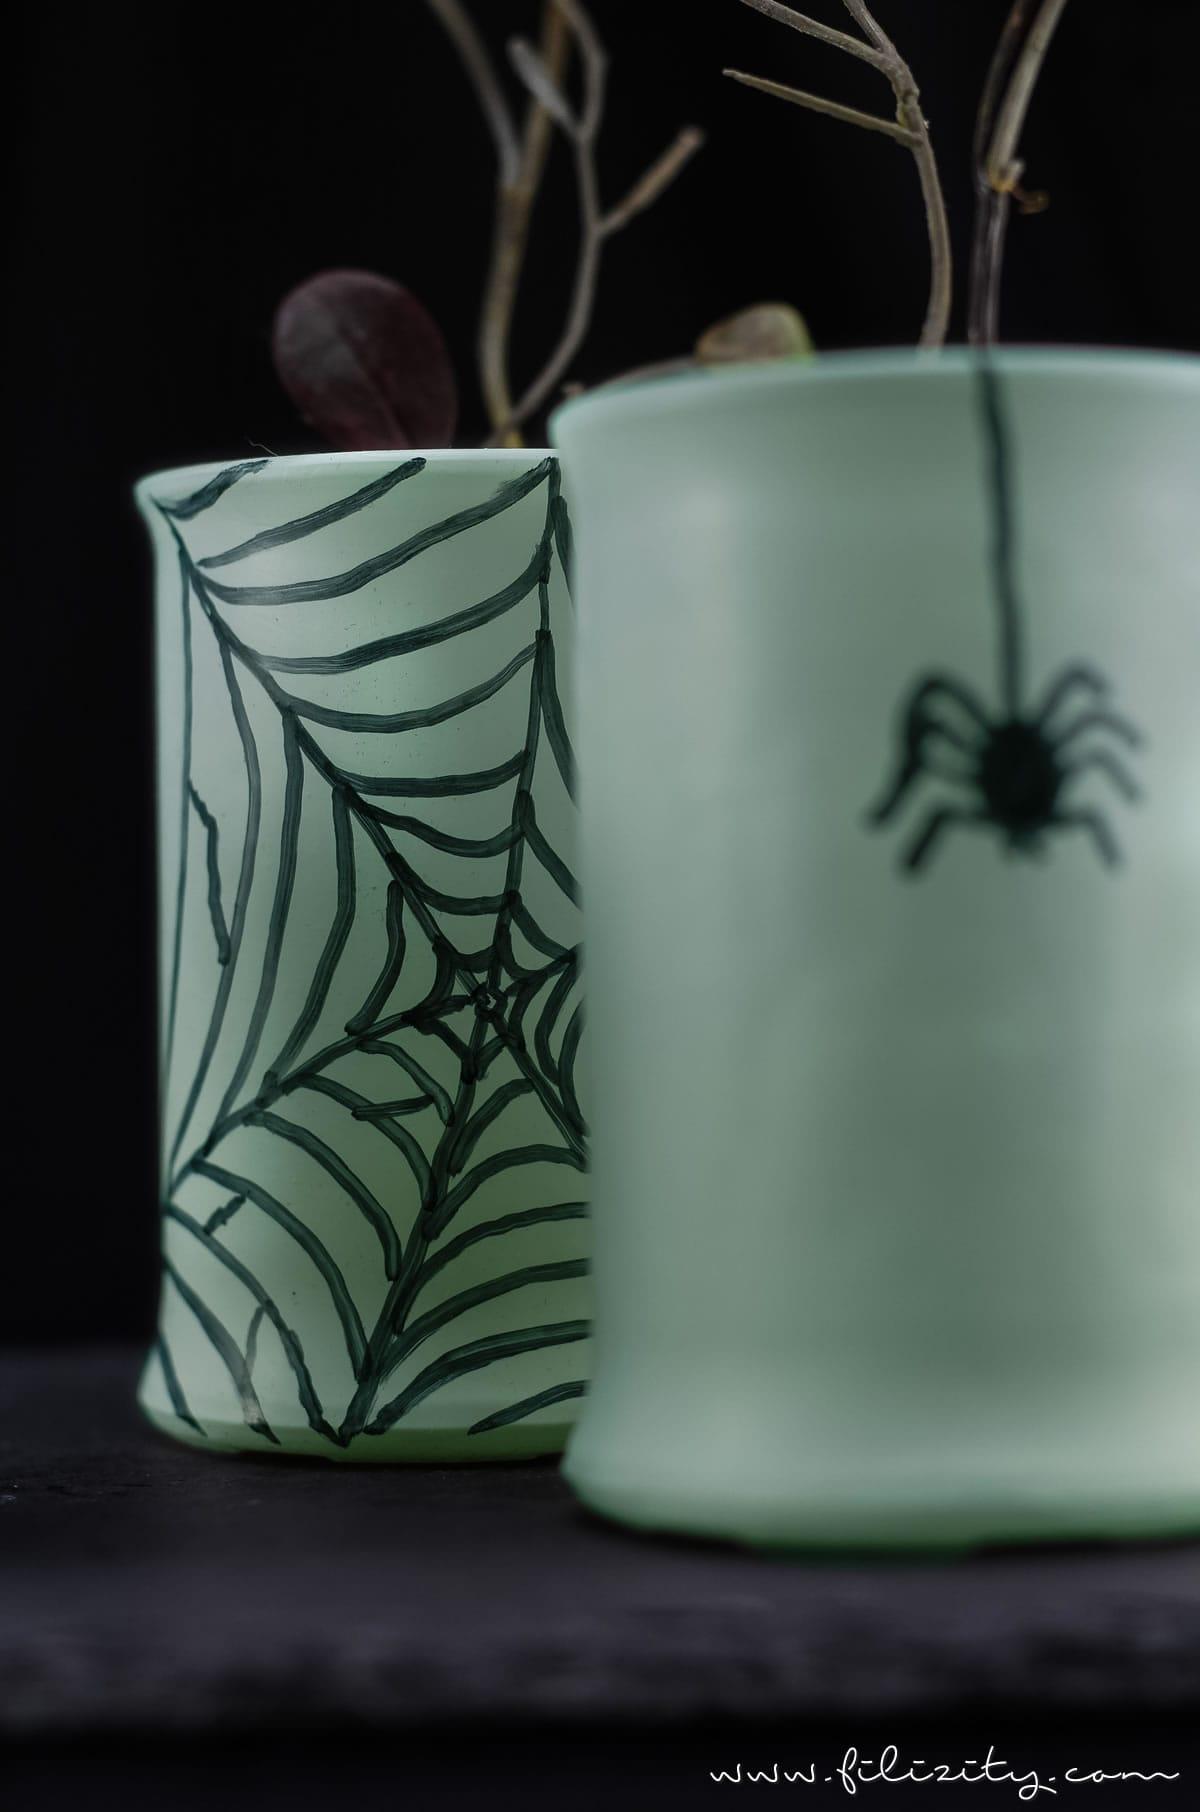 Einfache Halloween Deko Idee: Glow in the dark Vasen selber machen   Filizity.com   DIY-Blog aus dem Rheinland #halloween #deko